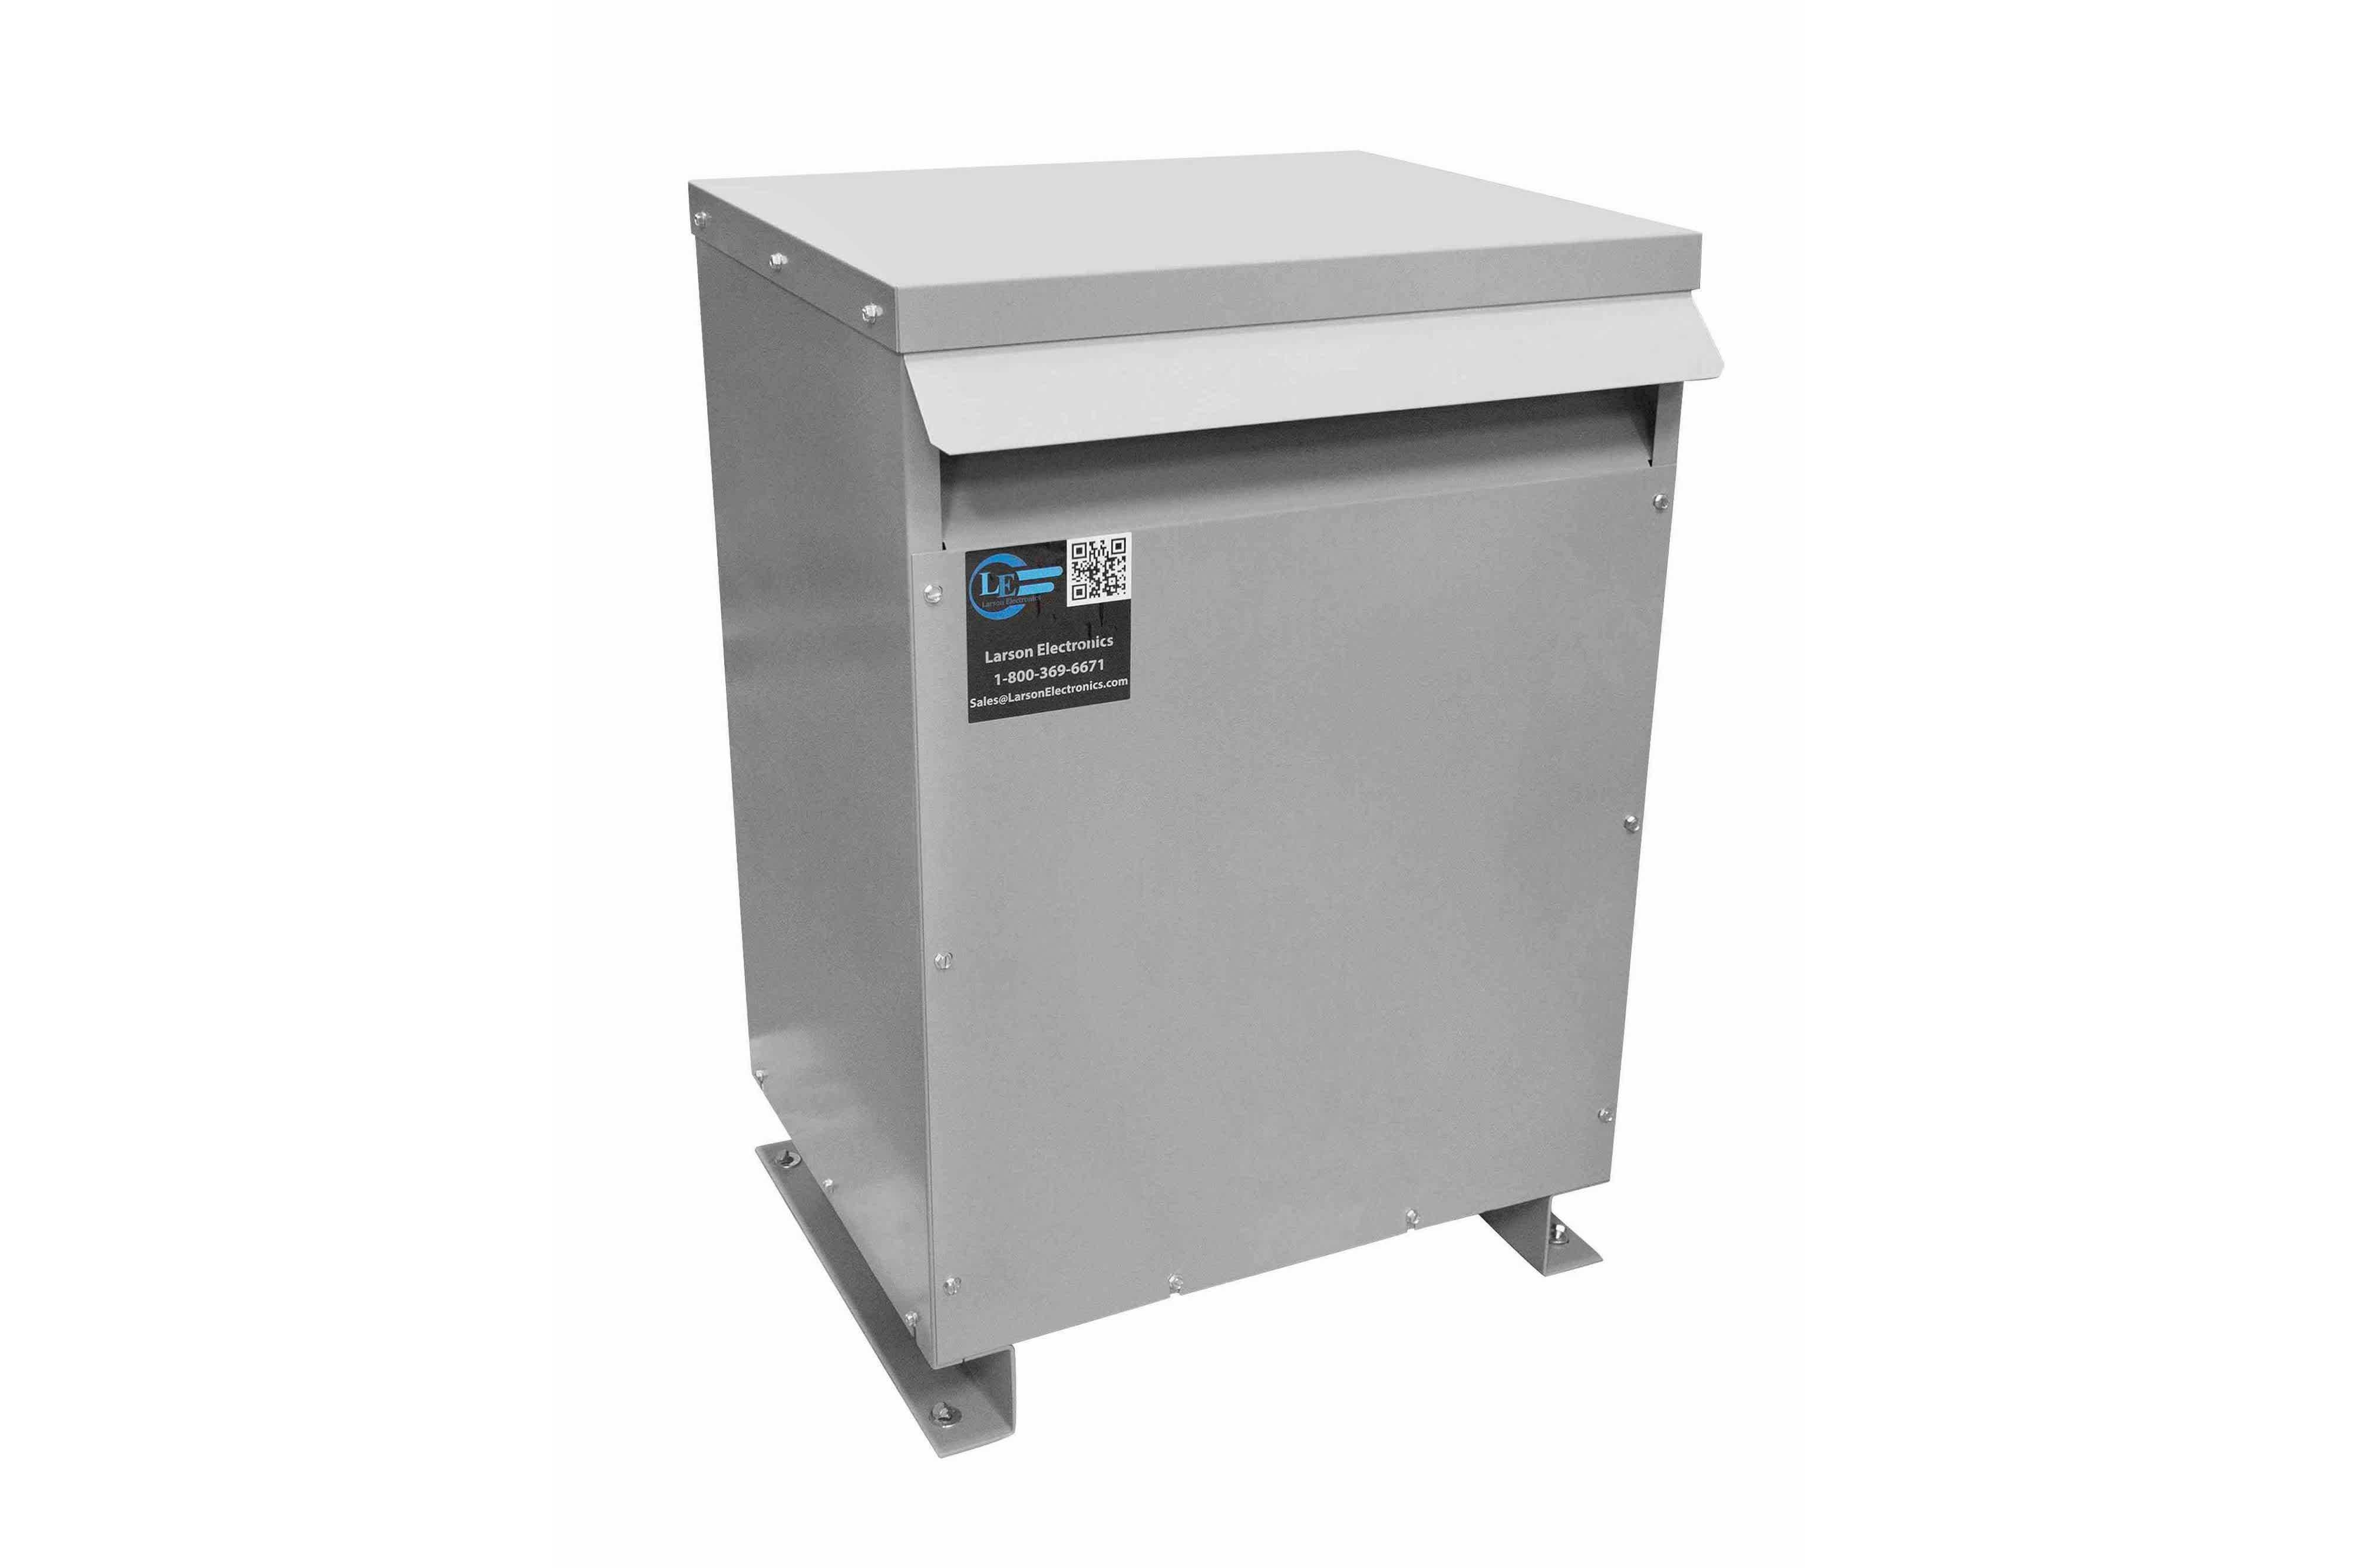 25 kVA 3PH Isolation Transformer, 600V Wye Primary, 480V Delta Secondary, N3R, Ventilated, 60 Hz